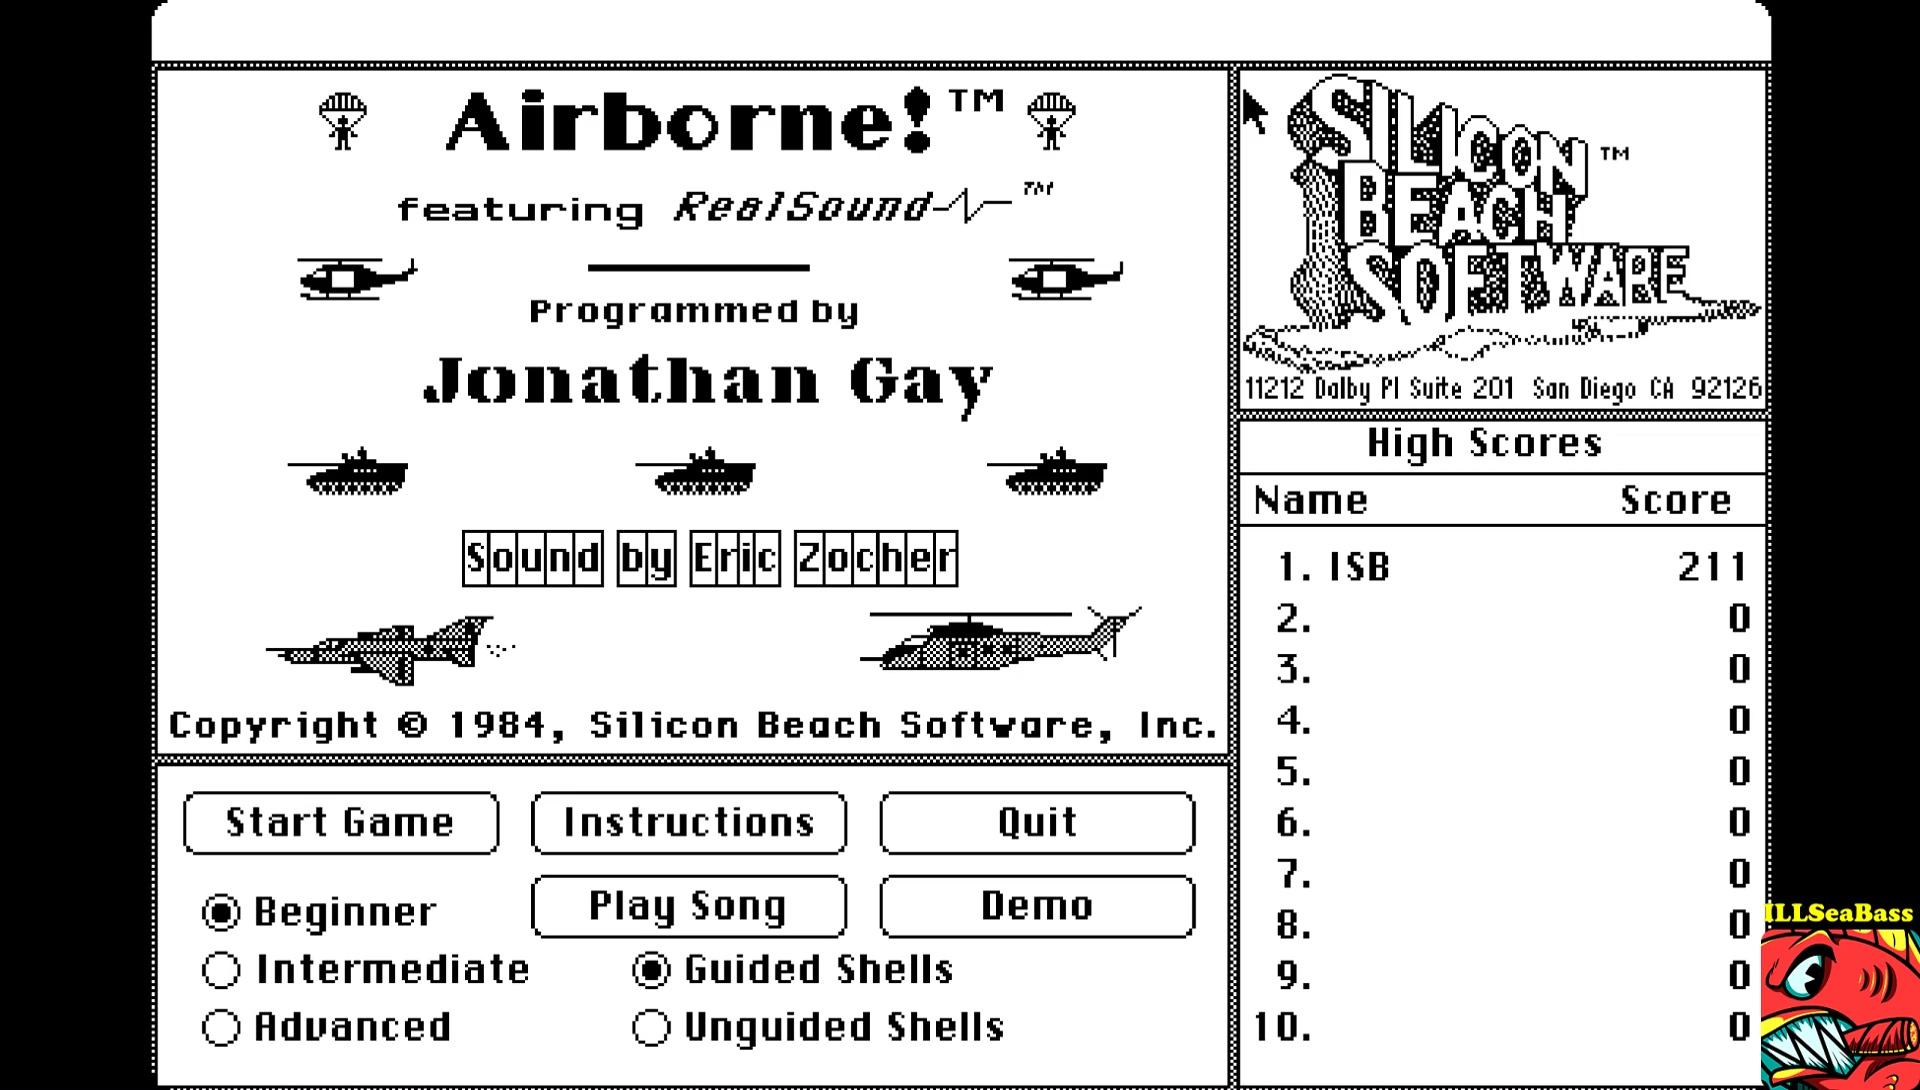 ILLSeaBass: Airborne! [Beginner] (Mac OS Emulated) 211 points on 2017-05-20 12:36:19